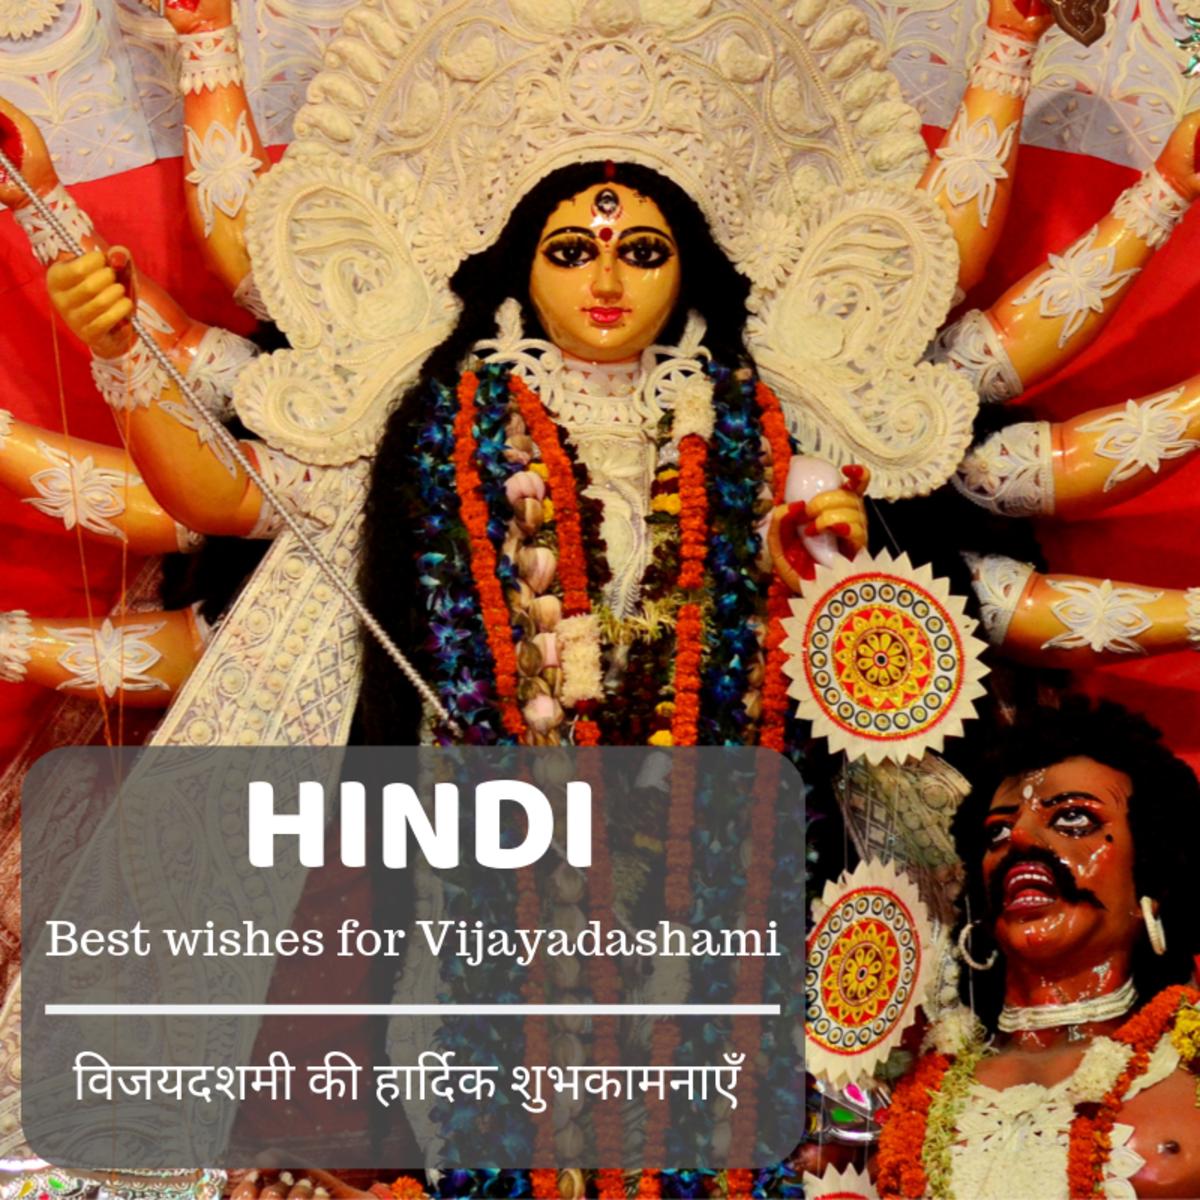 Best wishes for Vijayadashami—विजयदशमी की हार्दिक शुभकामनाएँ